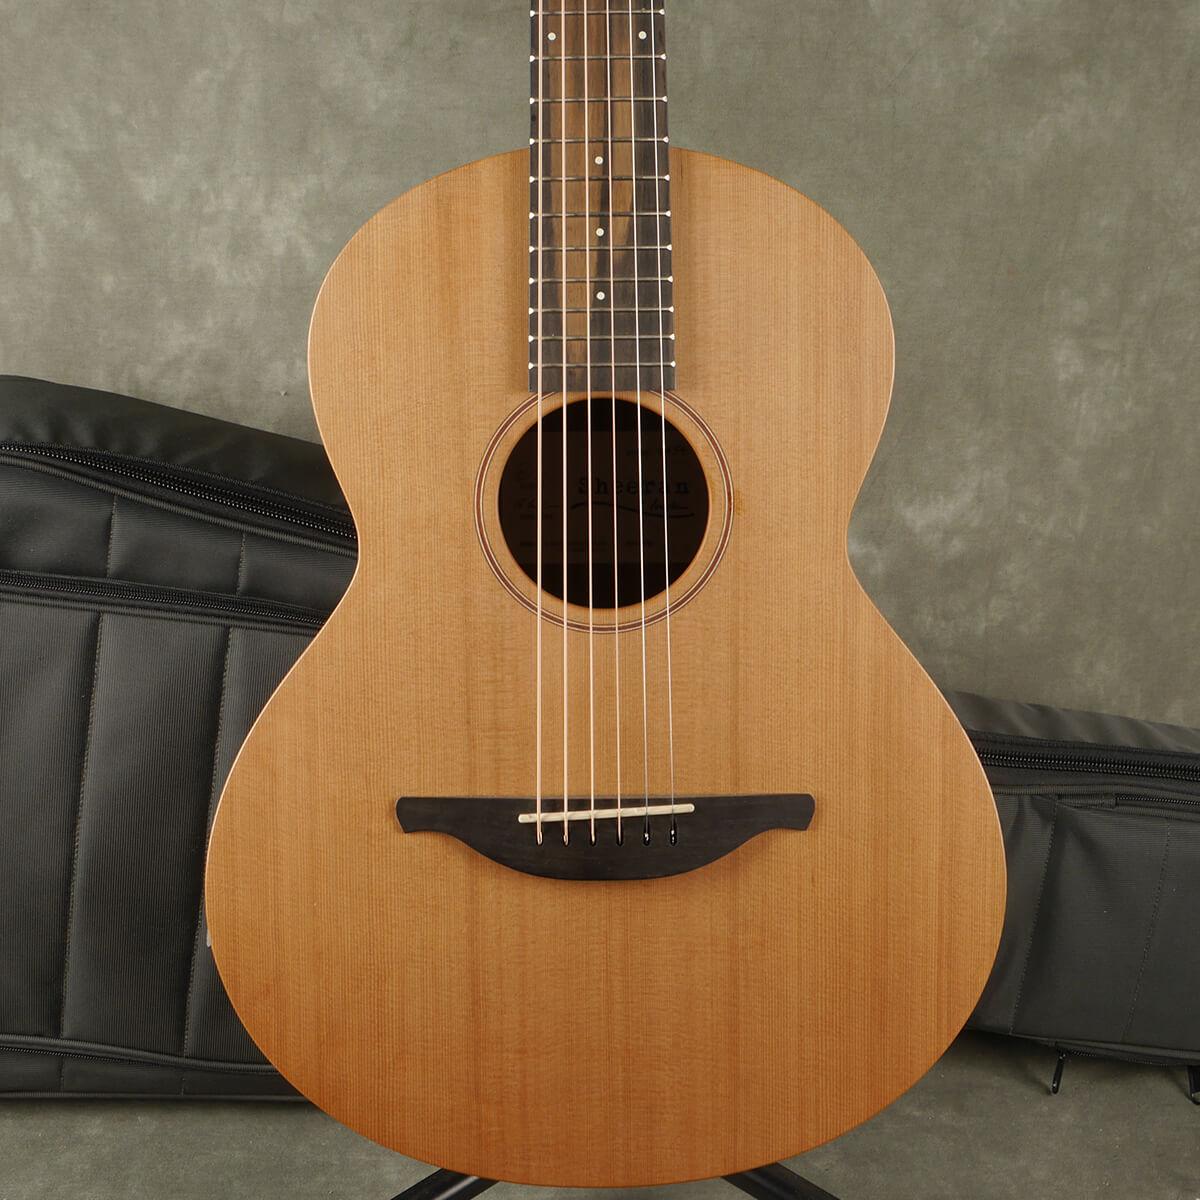 Sheeran W01 Acoustic Guitar - Natural w/Gig Bag - 2nd Hand